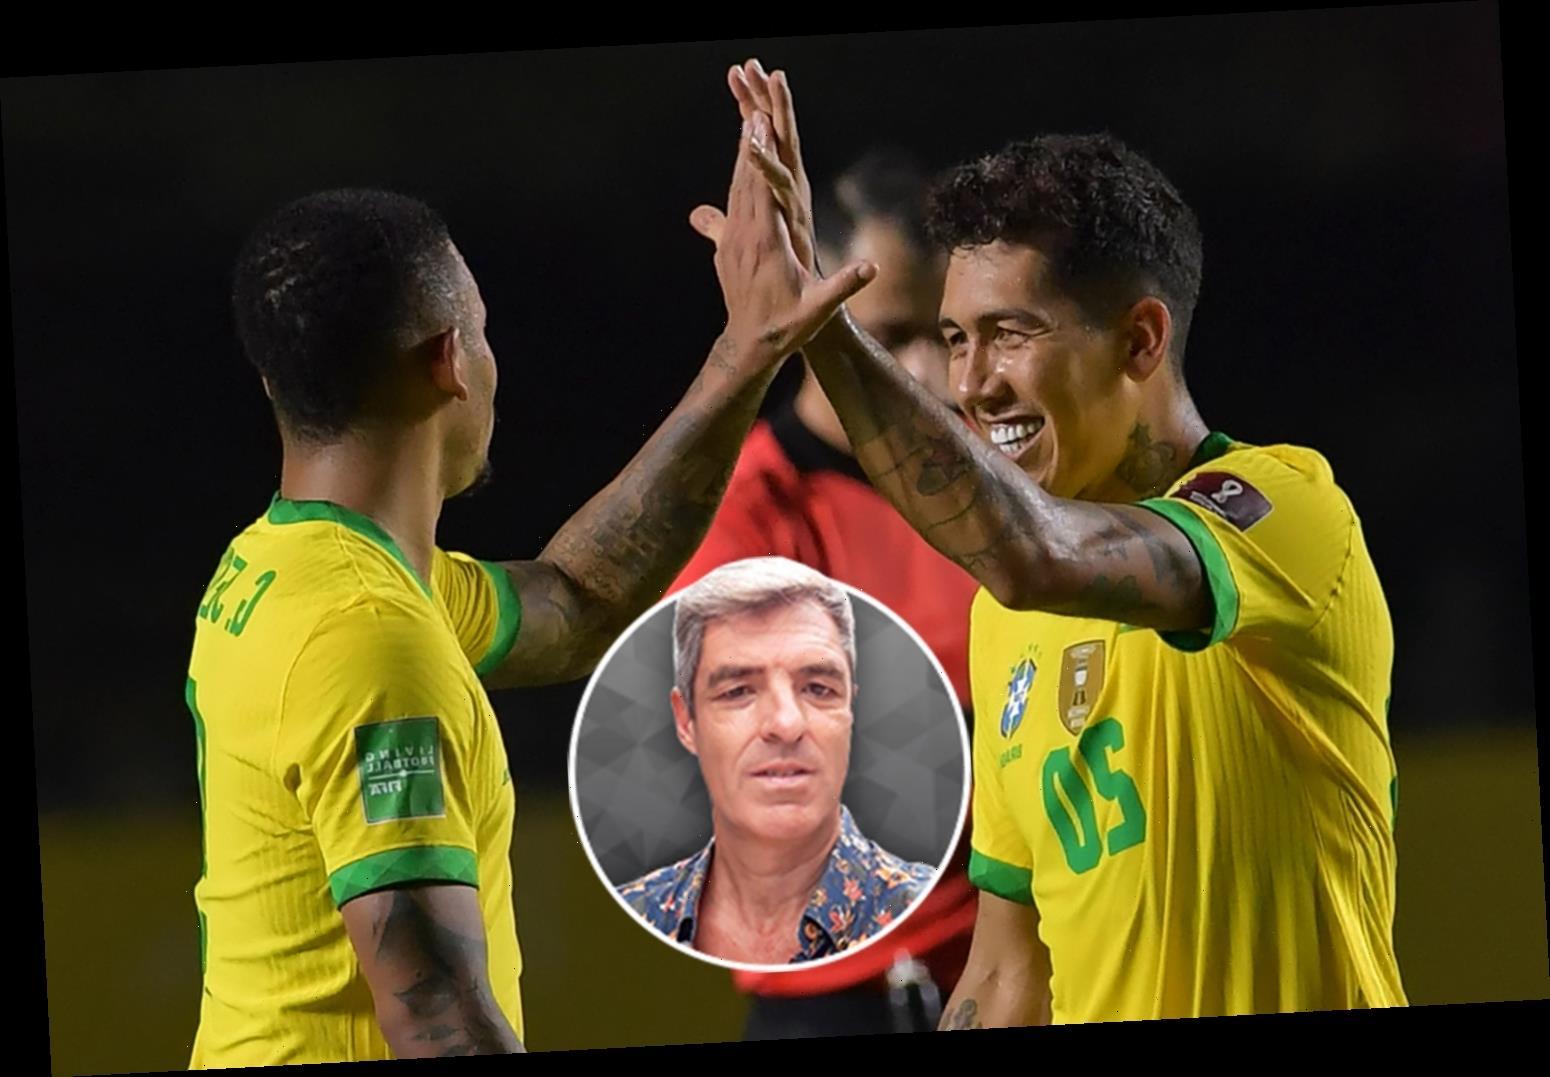 Brazil's forwards Firmino, Richarlison and Jesus struggled against Venezuela, and next face acid test against Uruguay